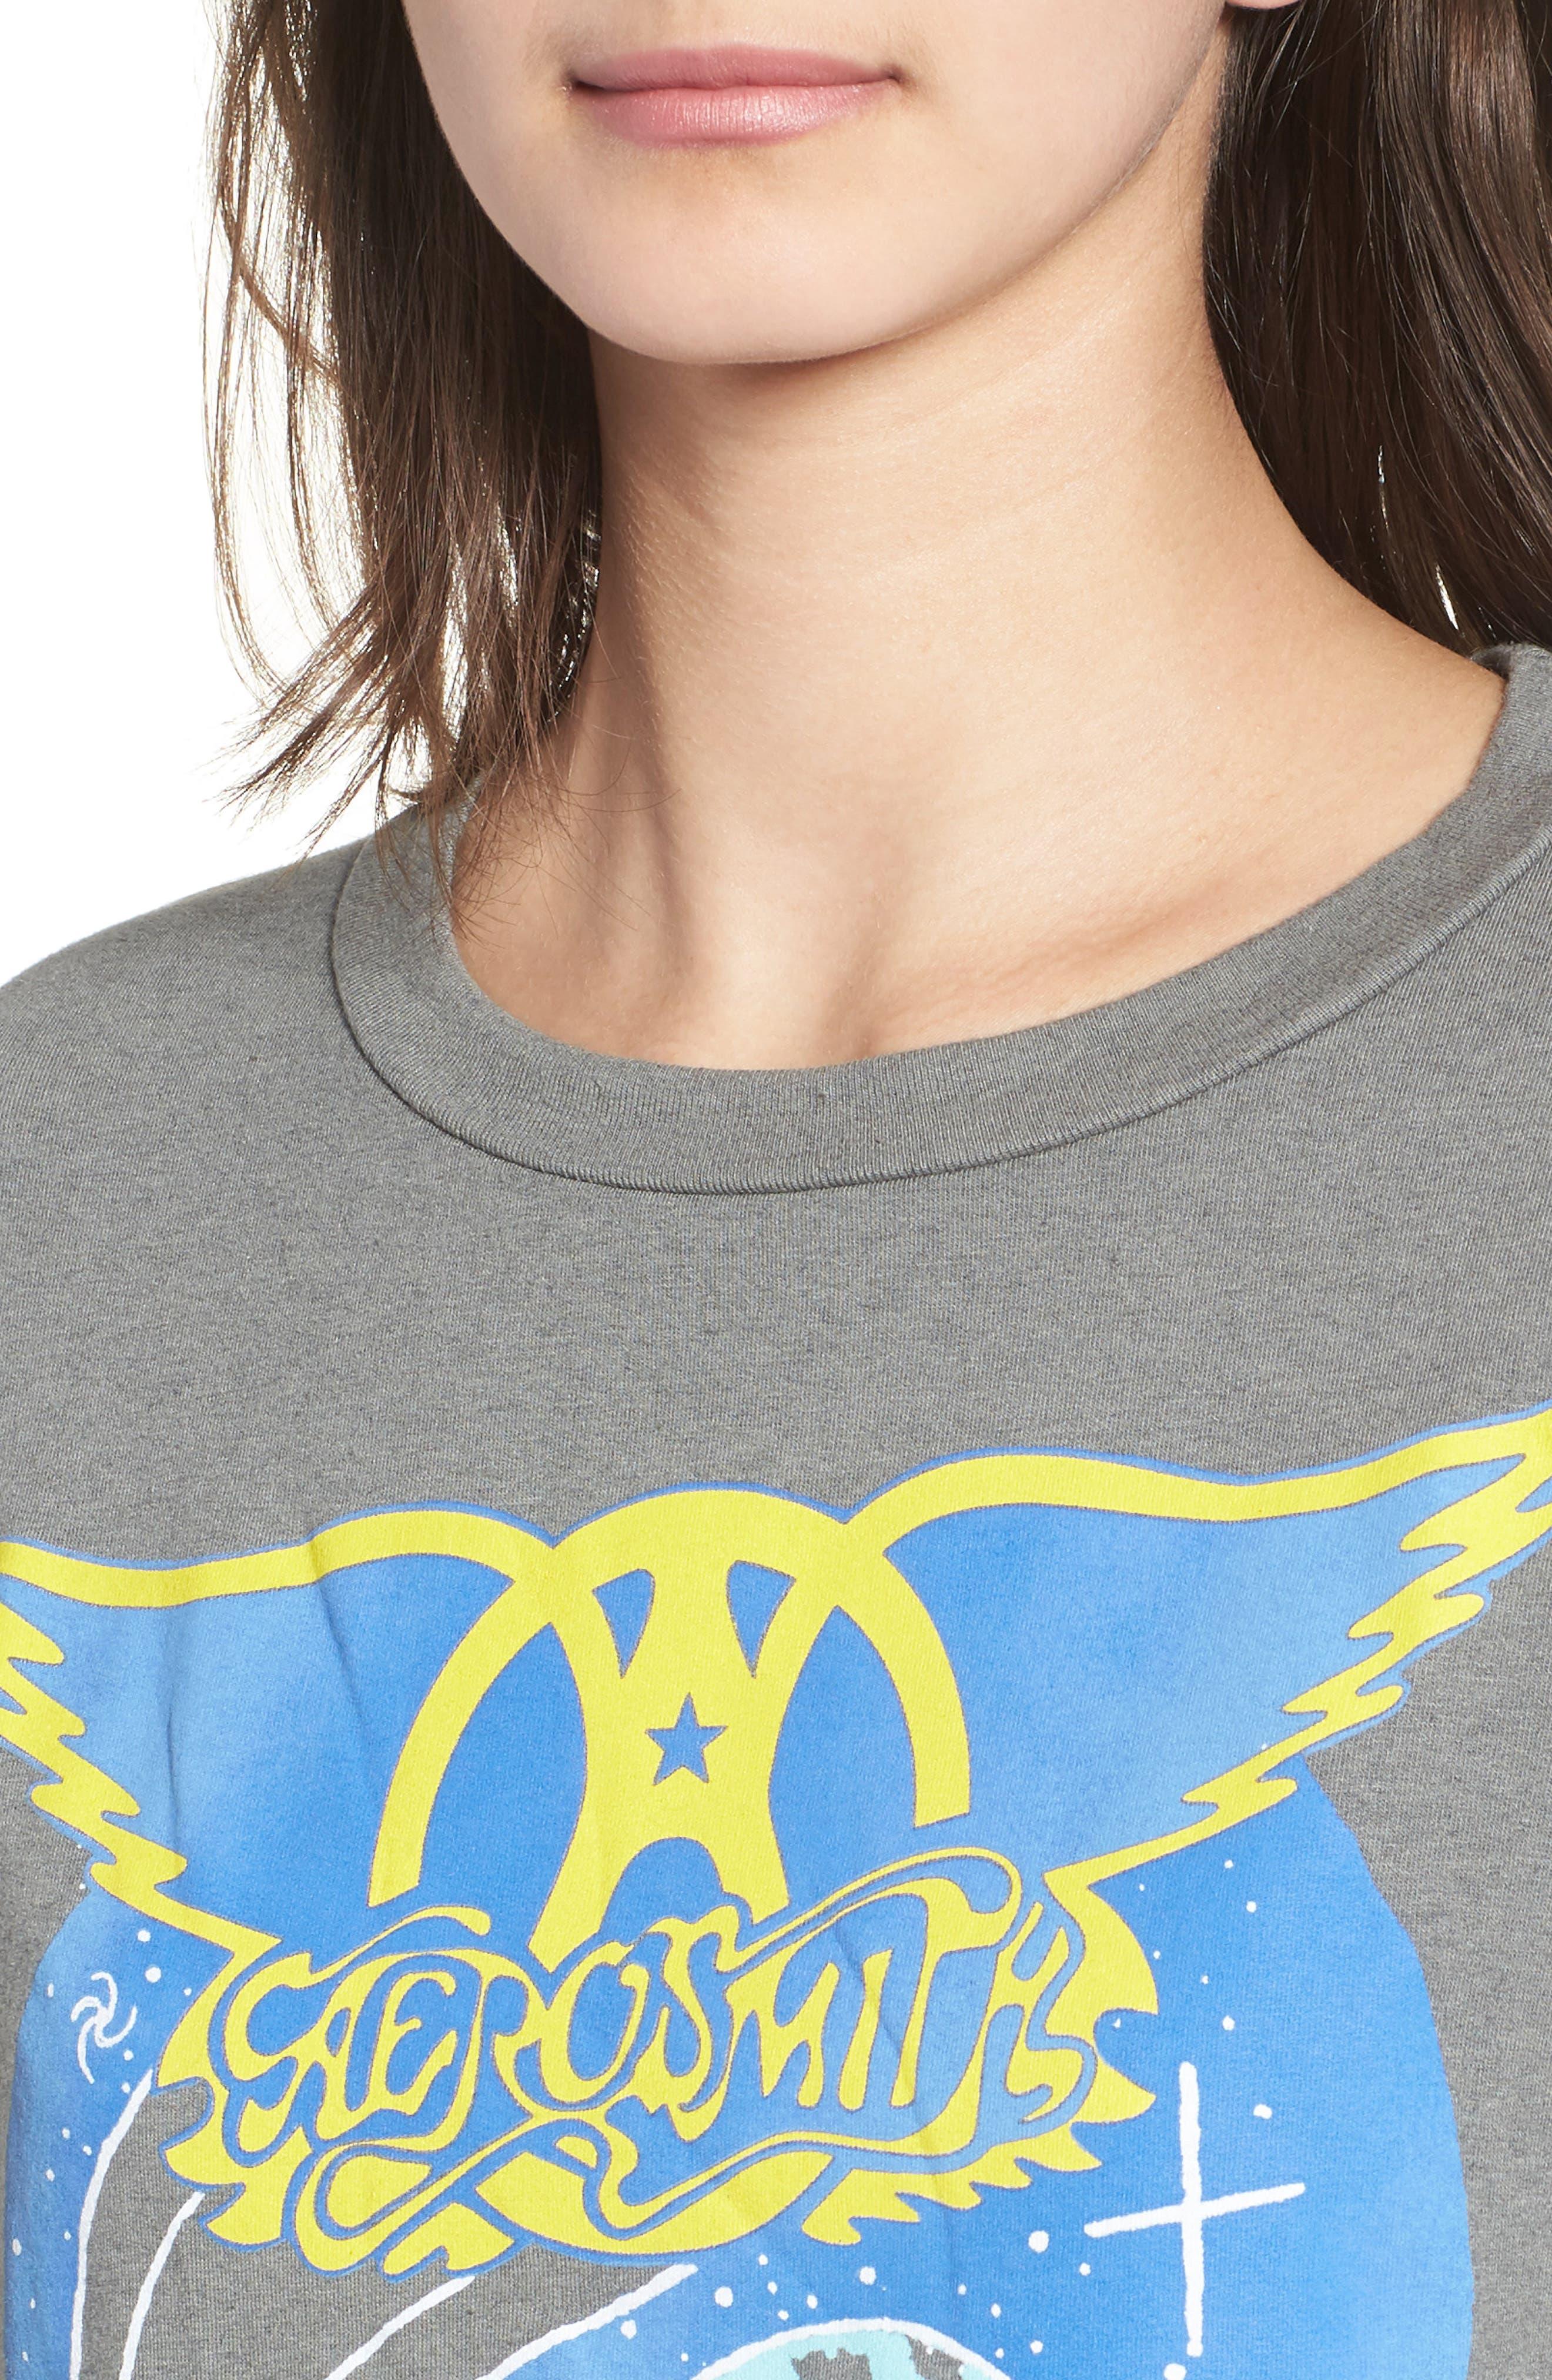 Aerosmith Sweatshirt,                             Alternate thumbnail 4, color,                             378